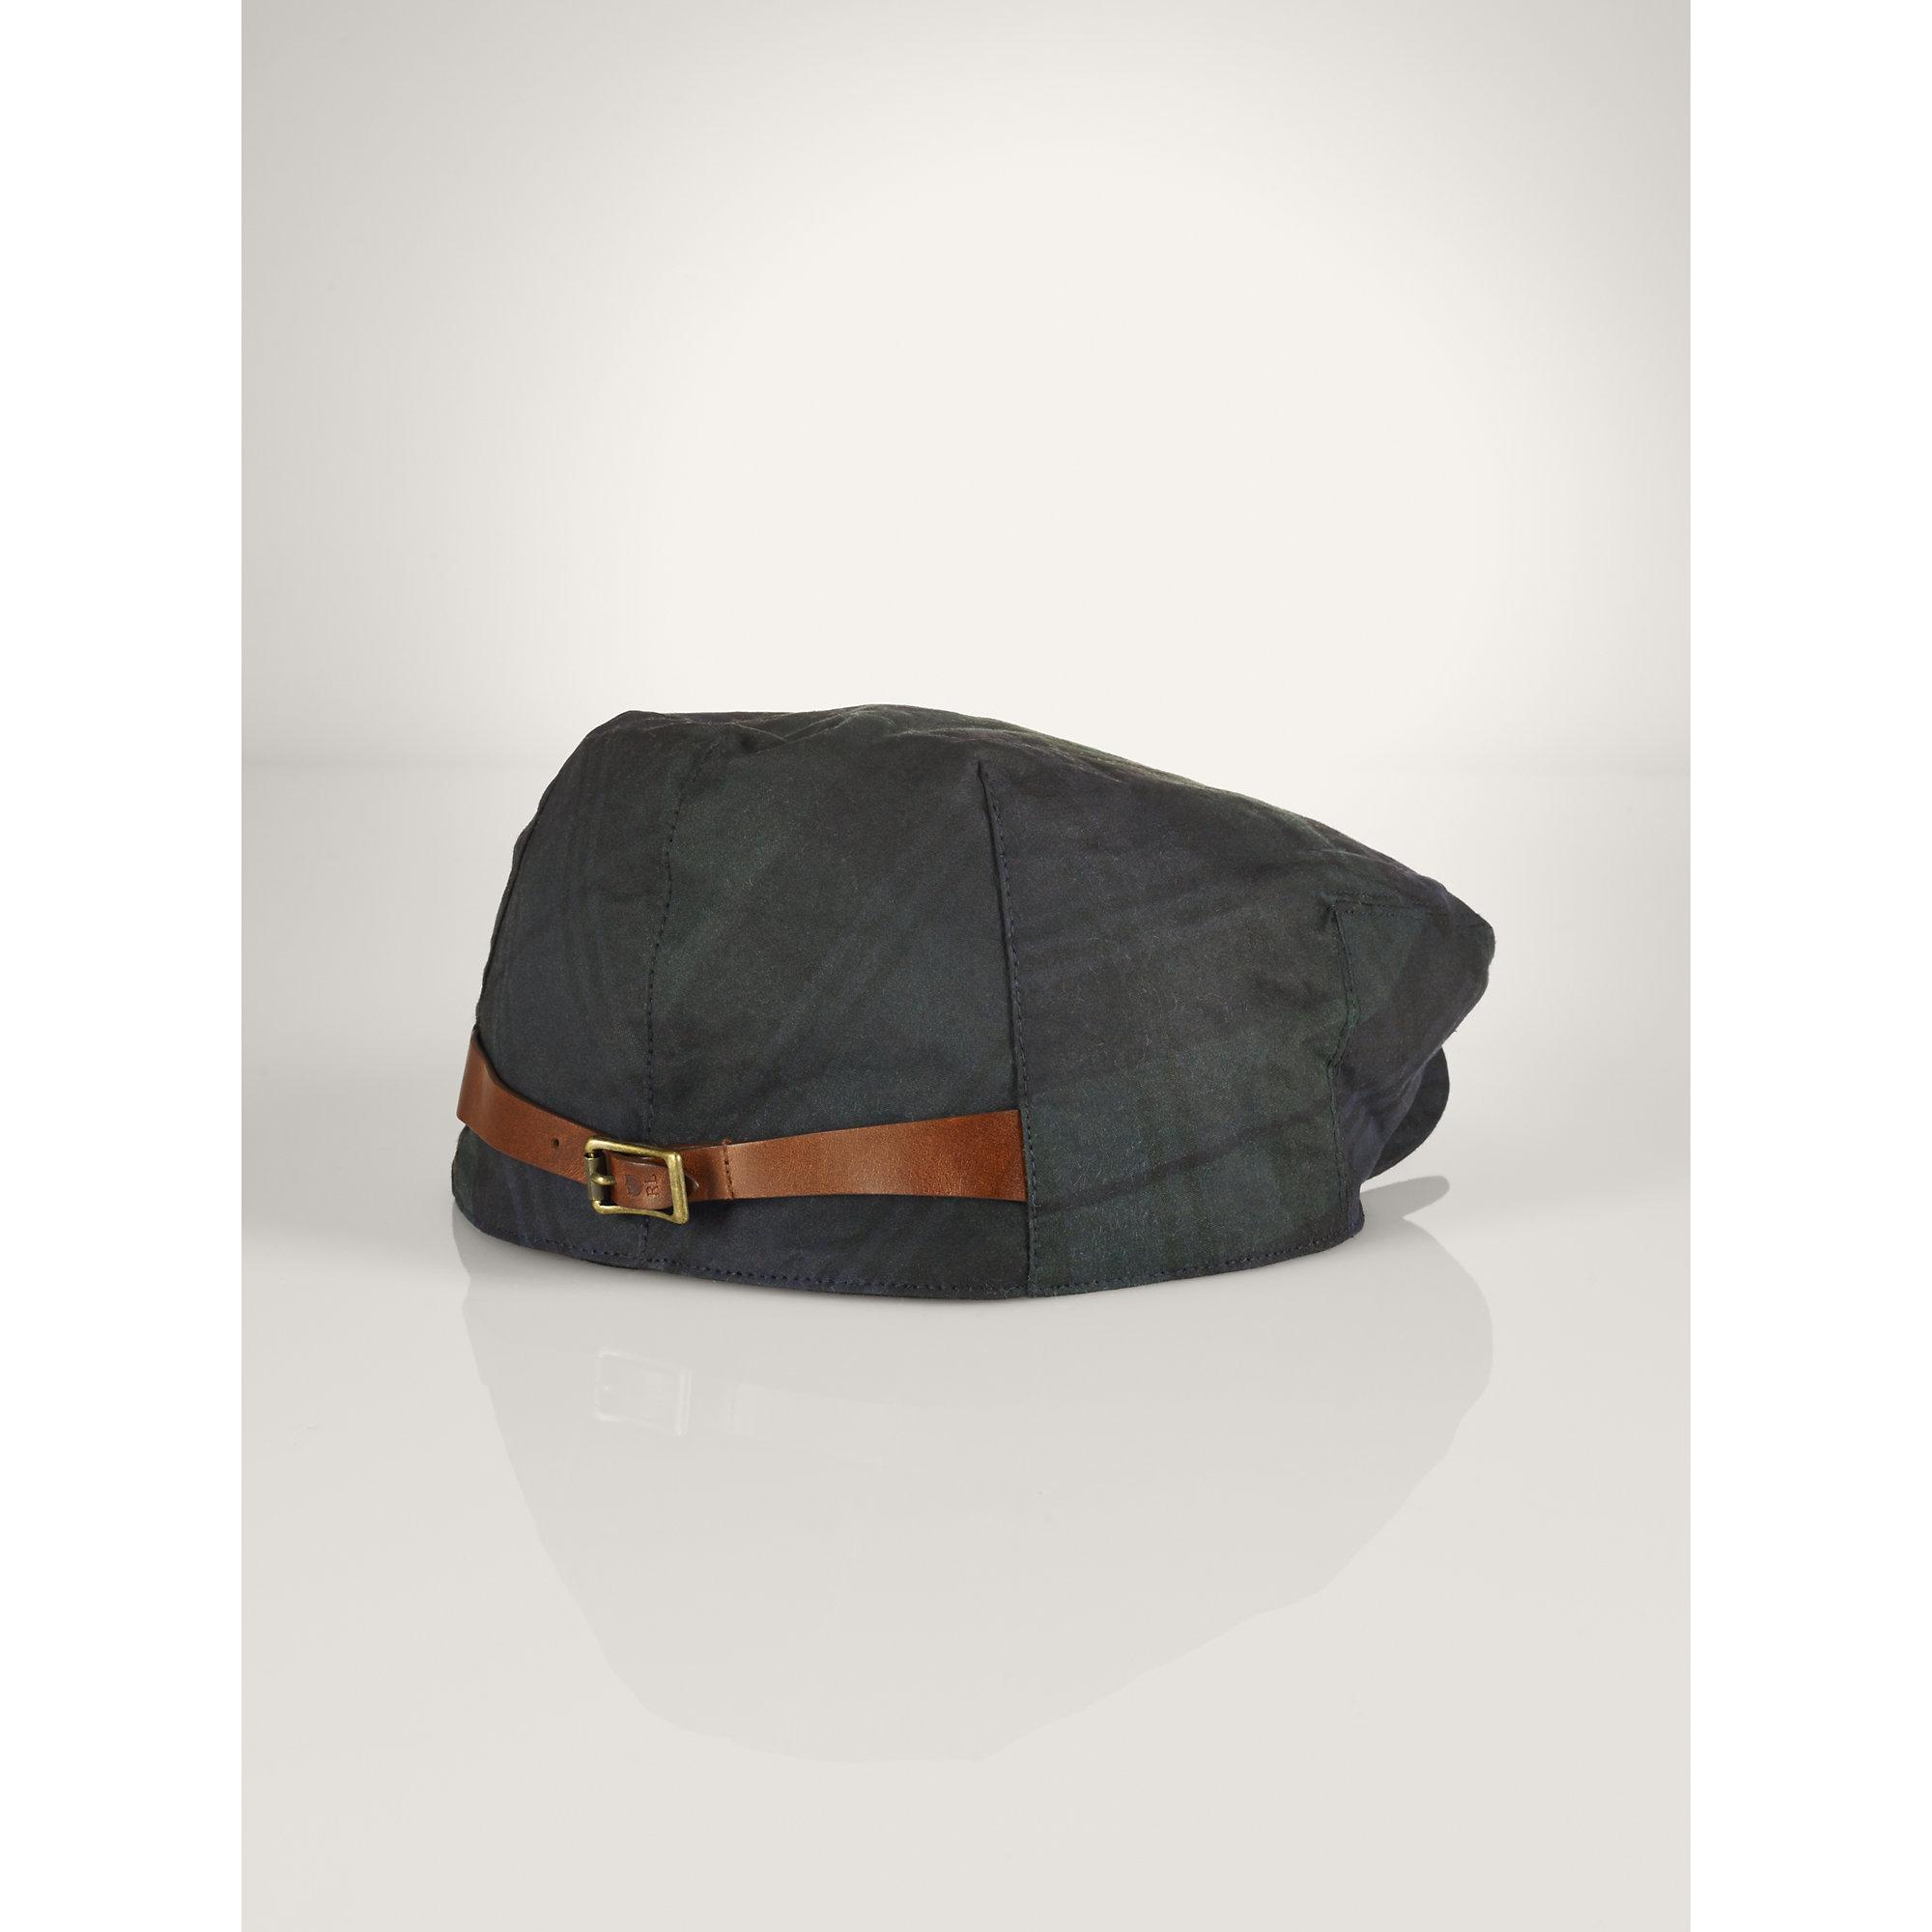 8cea278f78388 Polo Ralph Lauren Blackwatch Tartan Driving Cap in Black for Men - Lyst